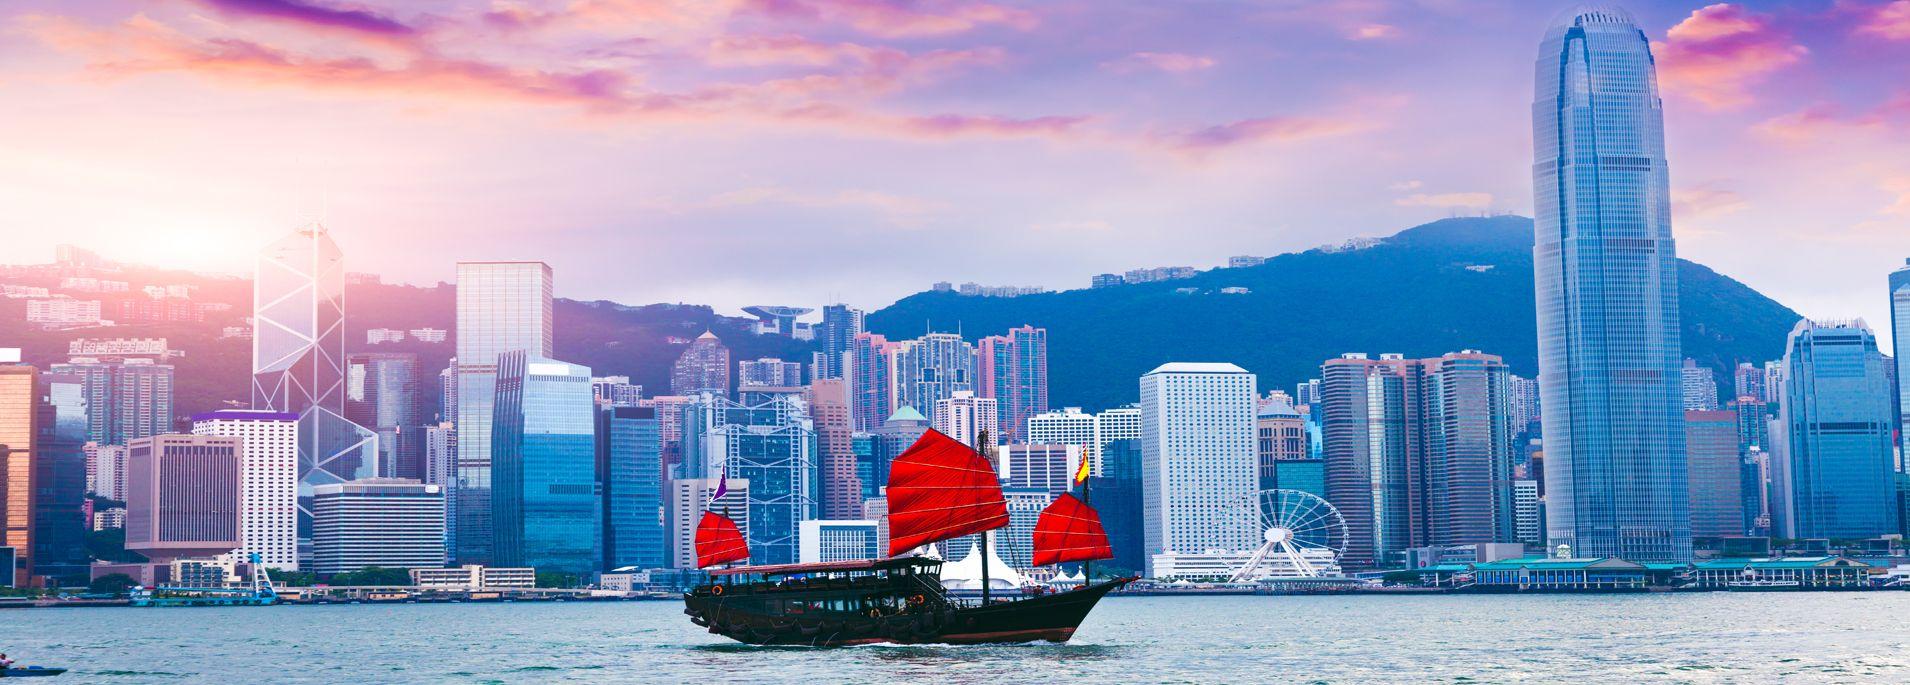 Hong Kong Dale Ventures